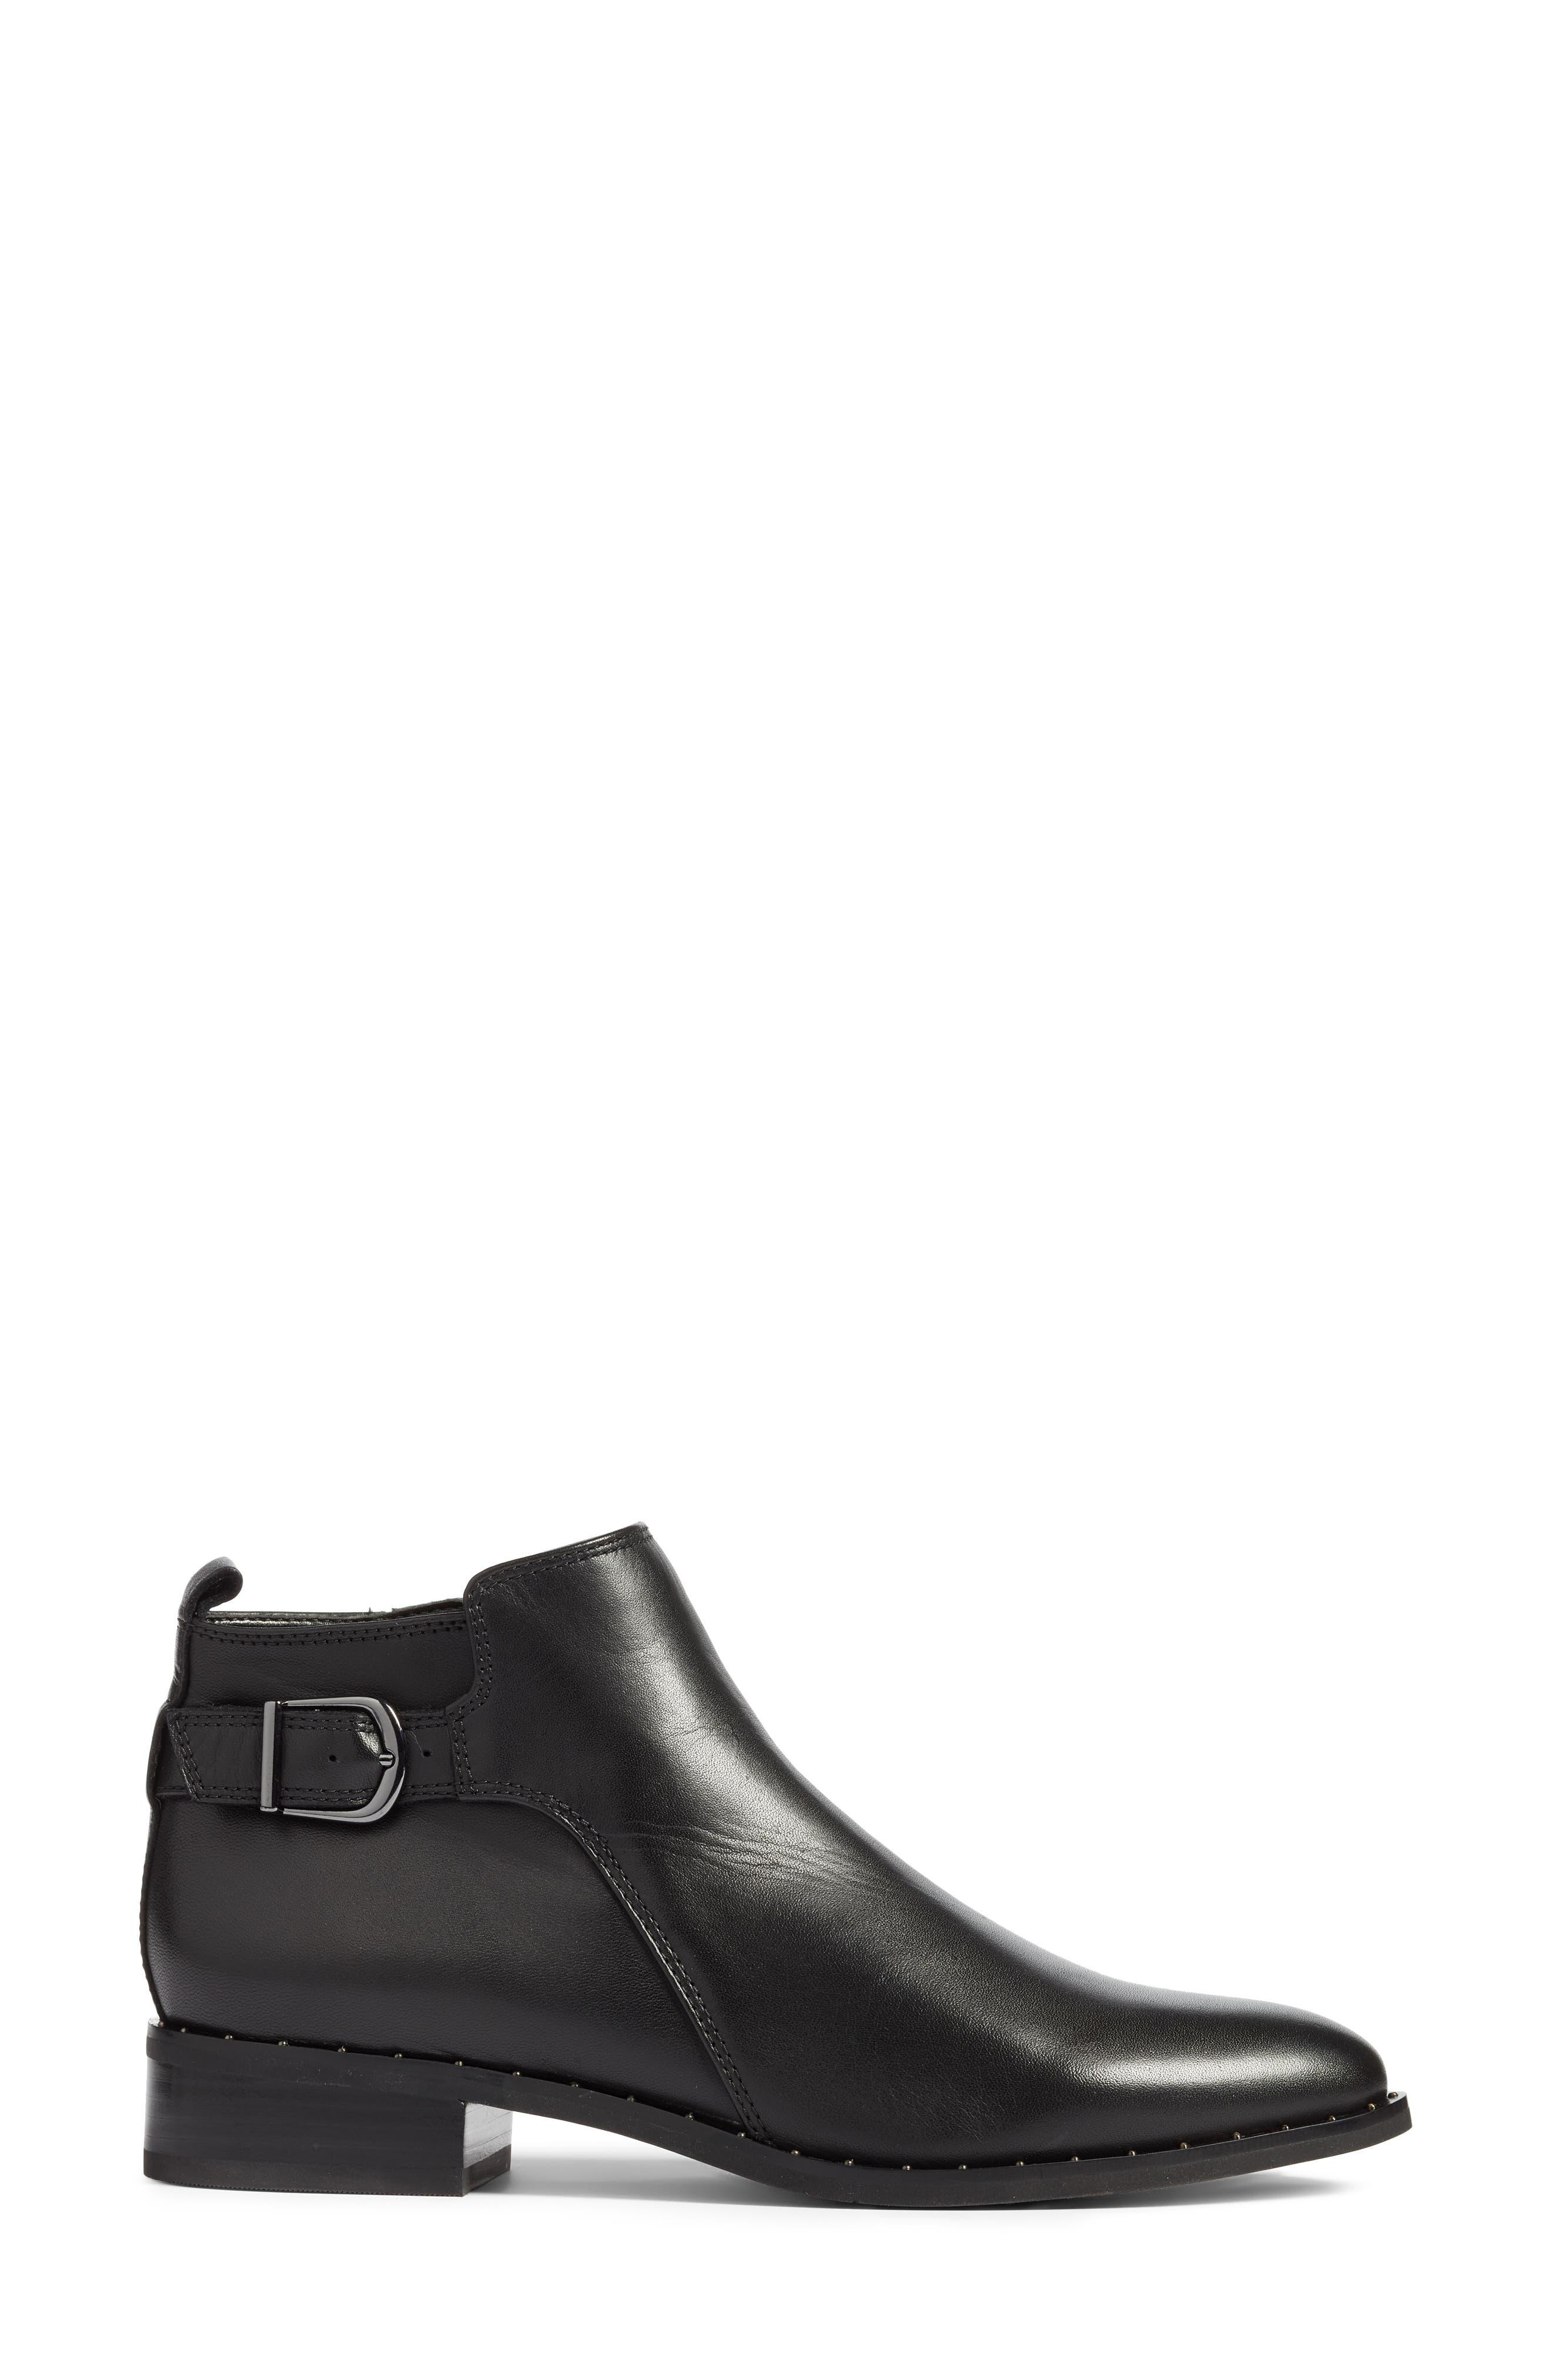 BLONDO, Tami Waterproof Moto Boot, Alternate thumbnail 3, color, BLACK LEATHER